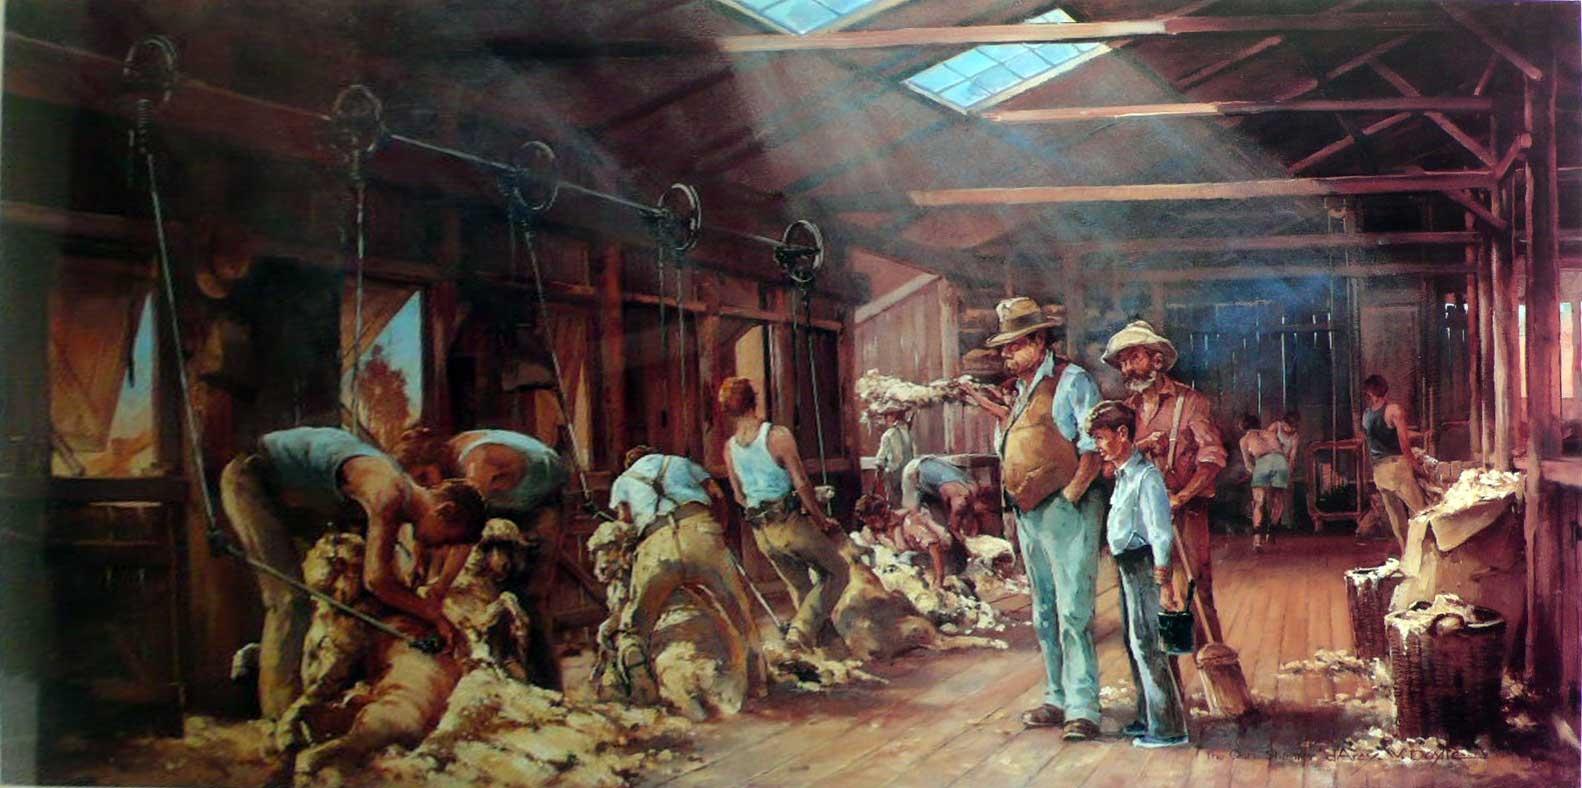 Darcy Doyle Paintings Prices